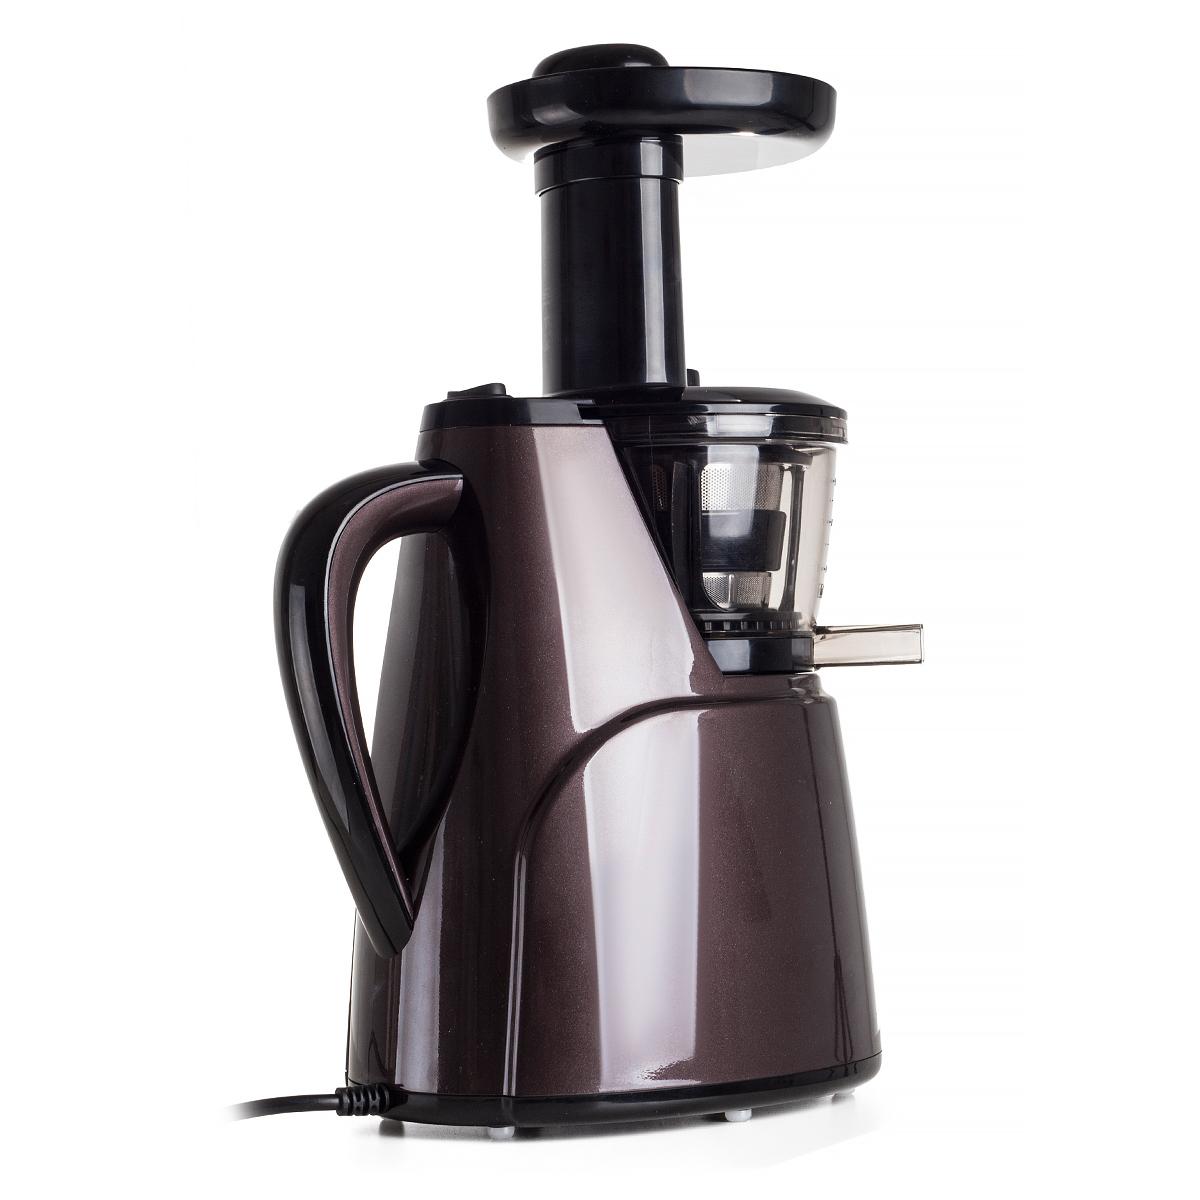 Wyciskarka Wolnoobrotowa Homekraft Slow Juicer Essence : Entsafter Saftpresse Obstpresse Gemusepresse Slow Juicer Slowjuicer NEU Essence eBay